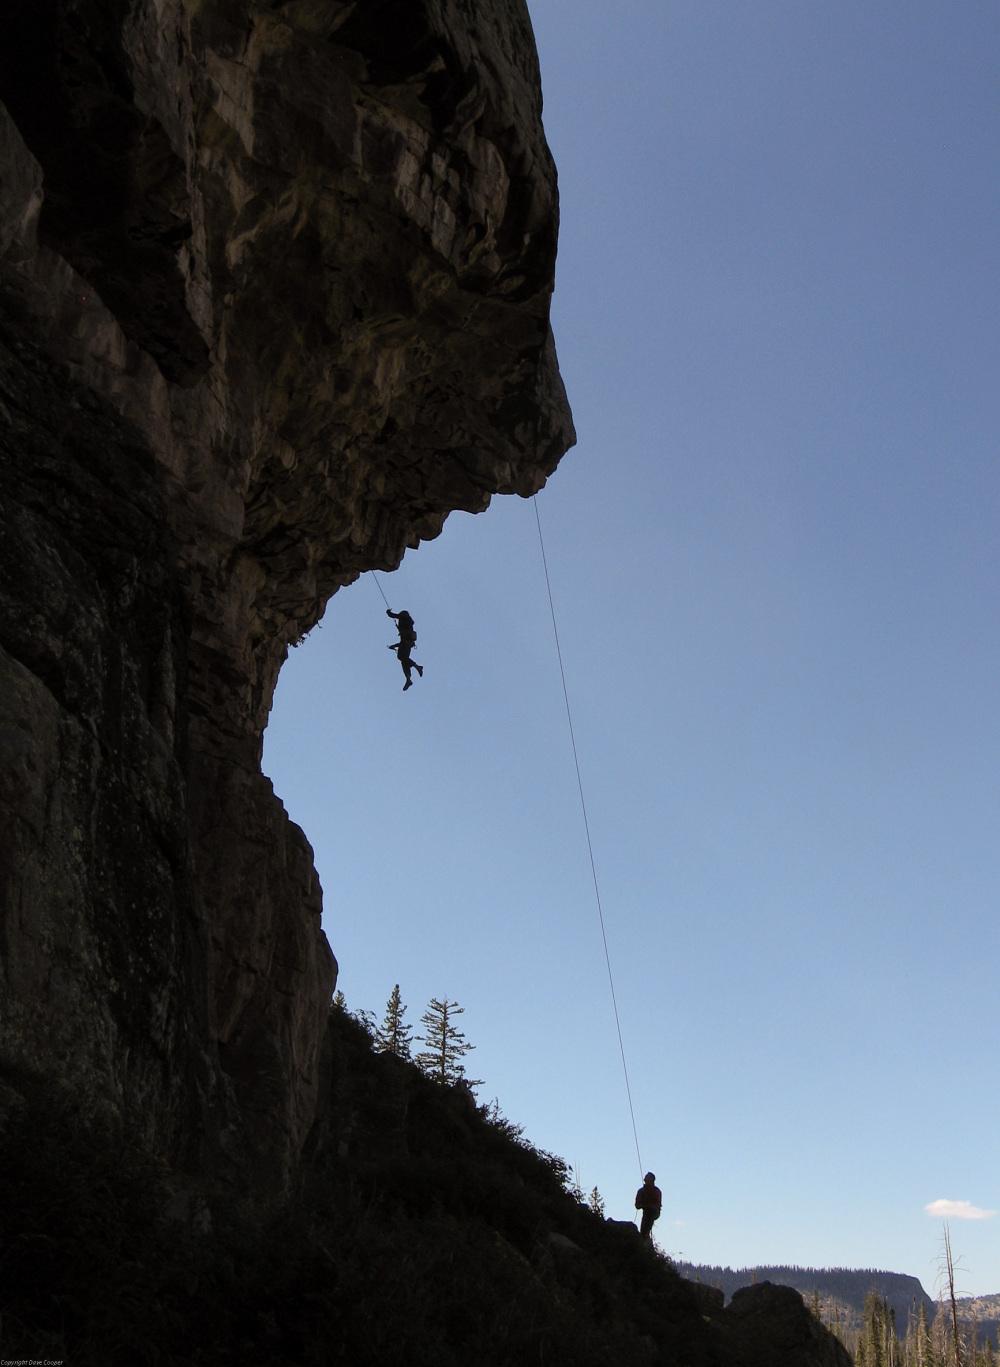 Sport Climbing in the High Uintahs, Utah